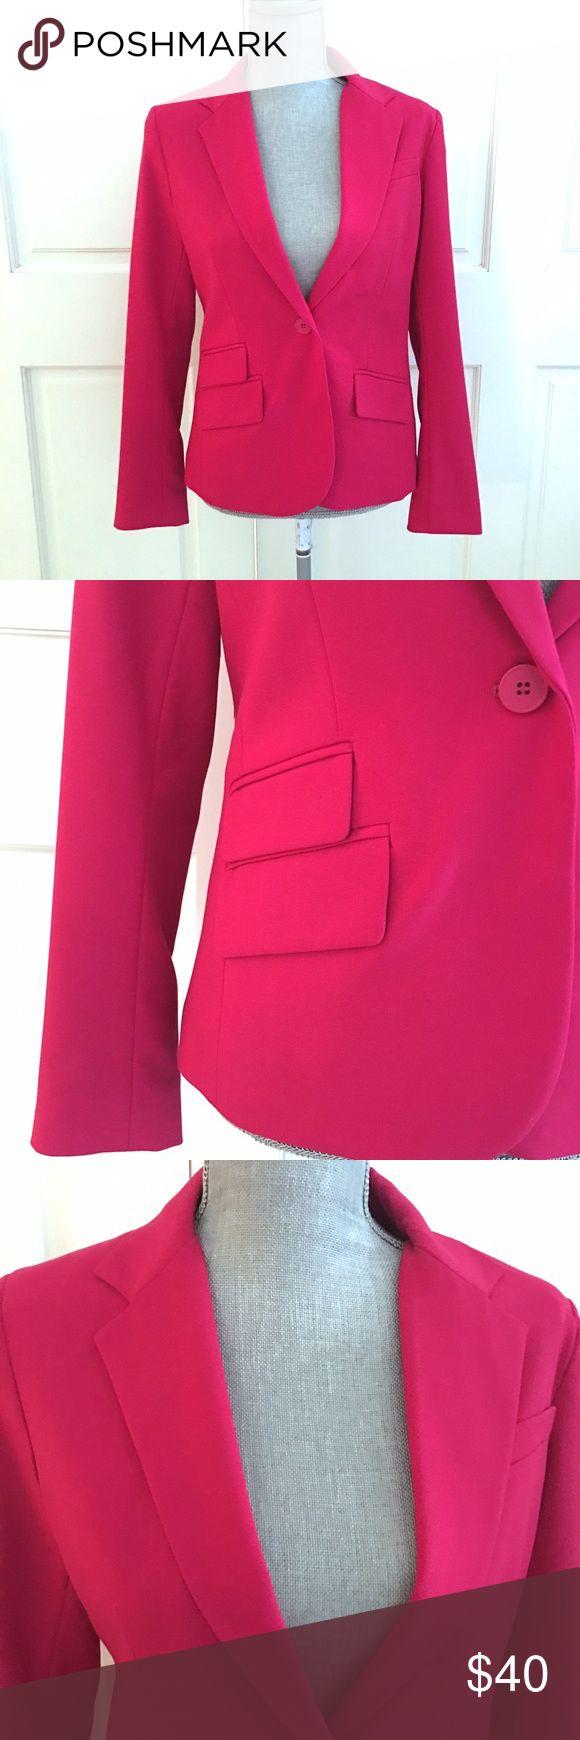 New York & Co. Hot Pink Blazer New York & Co. Hot Pink Blazer. Brand new with tags never worn. New York & Company Jackets & Coats Blazers